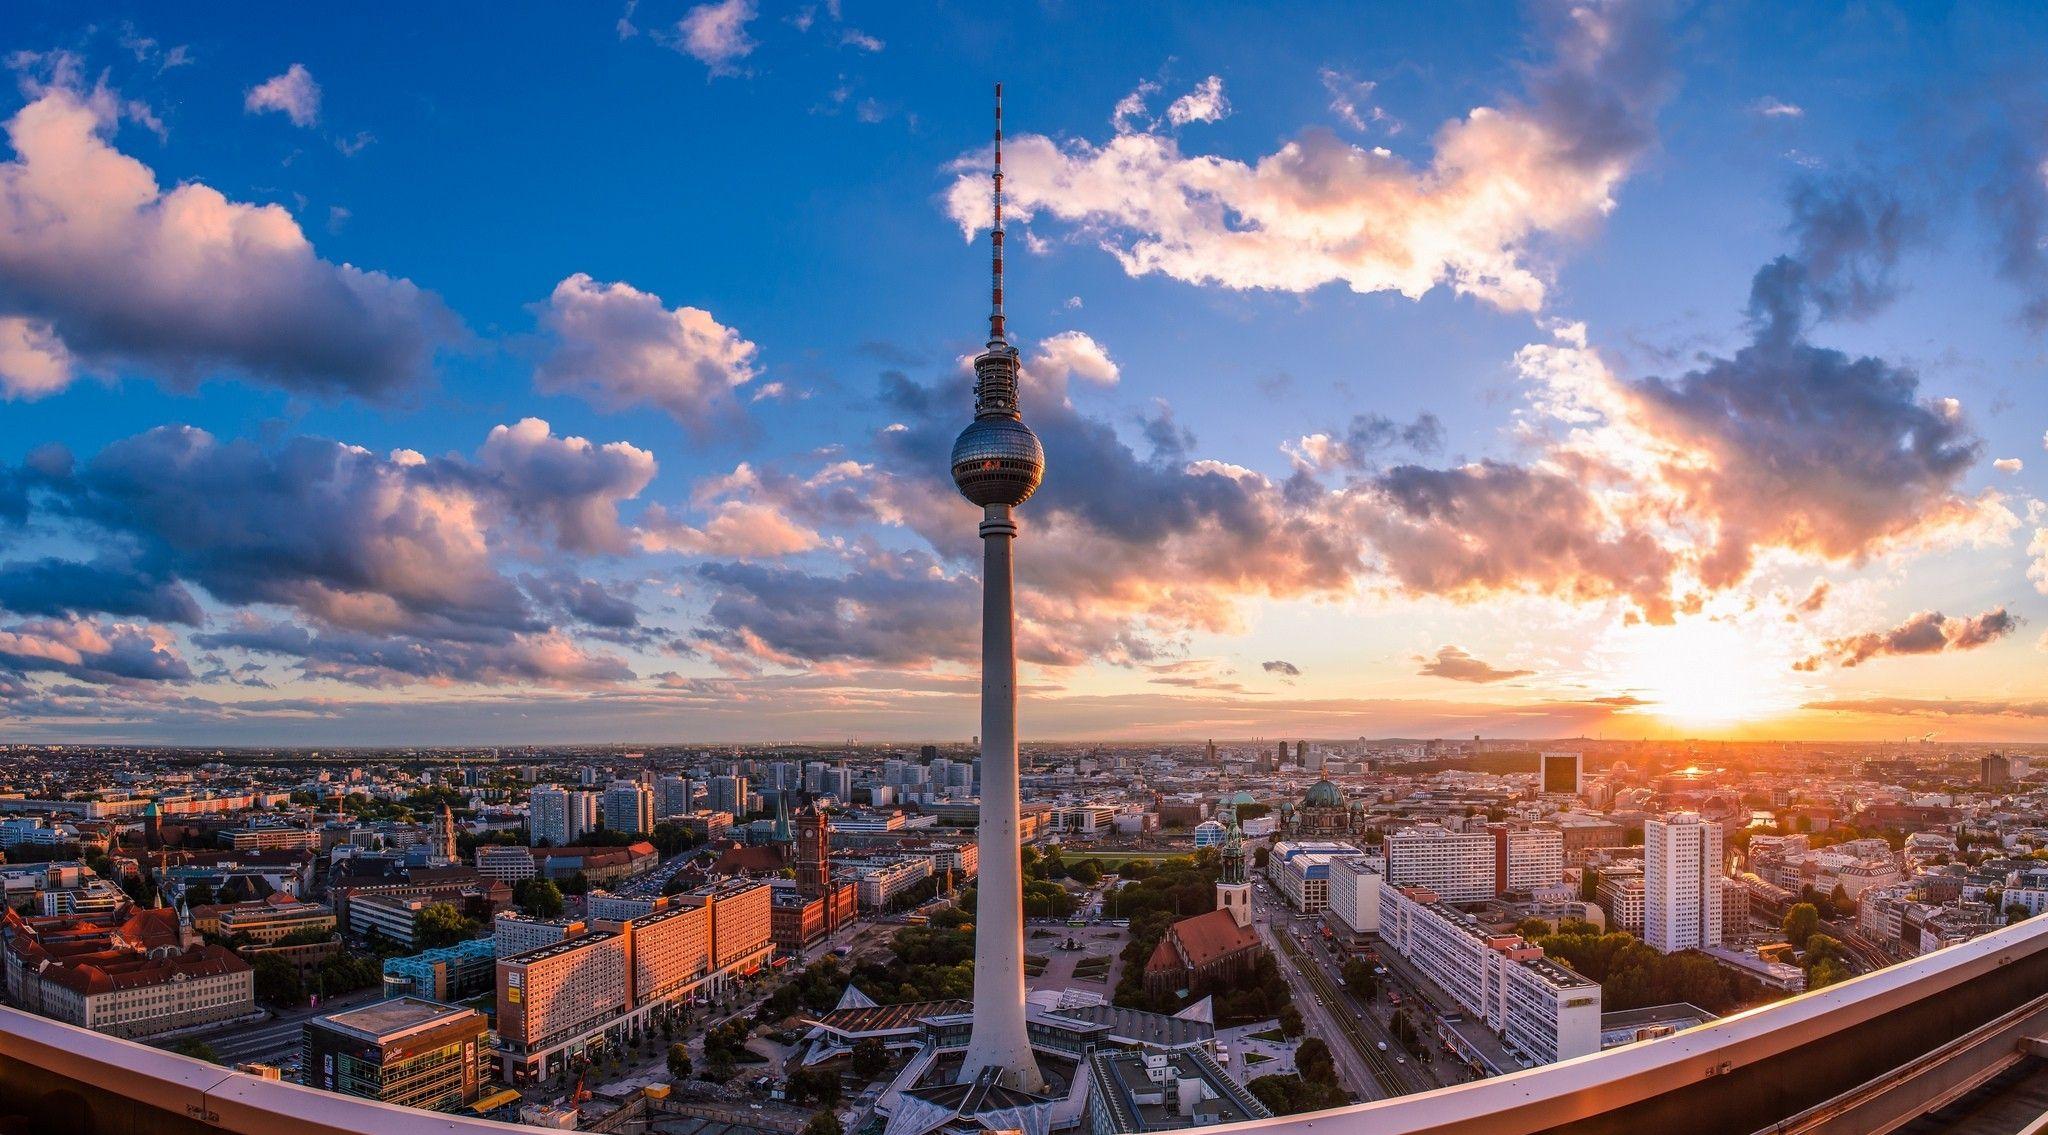 Fernsehturm States Of Germany Berlin World Cities